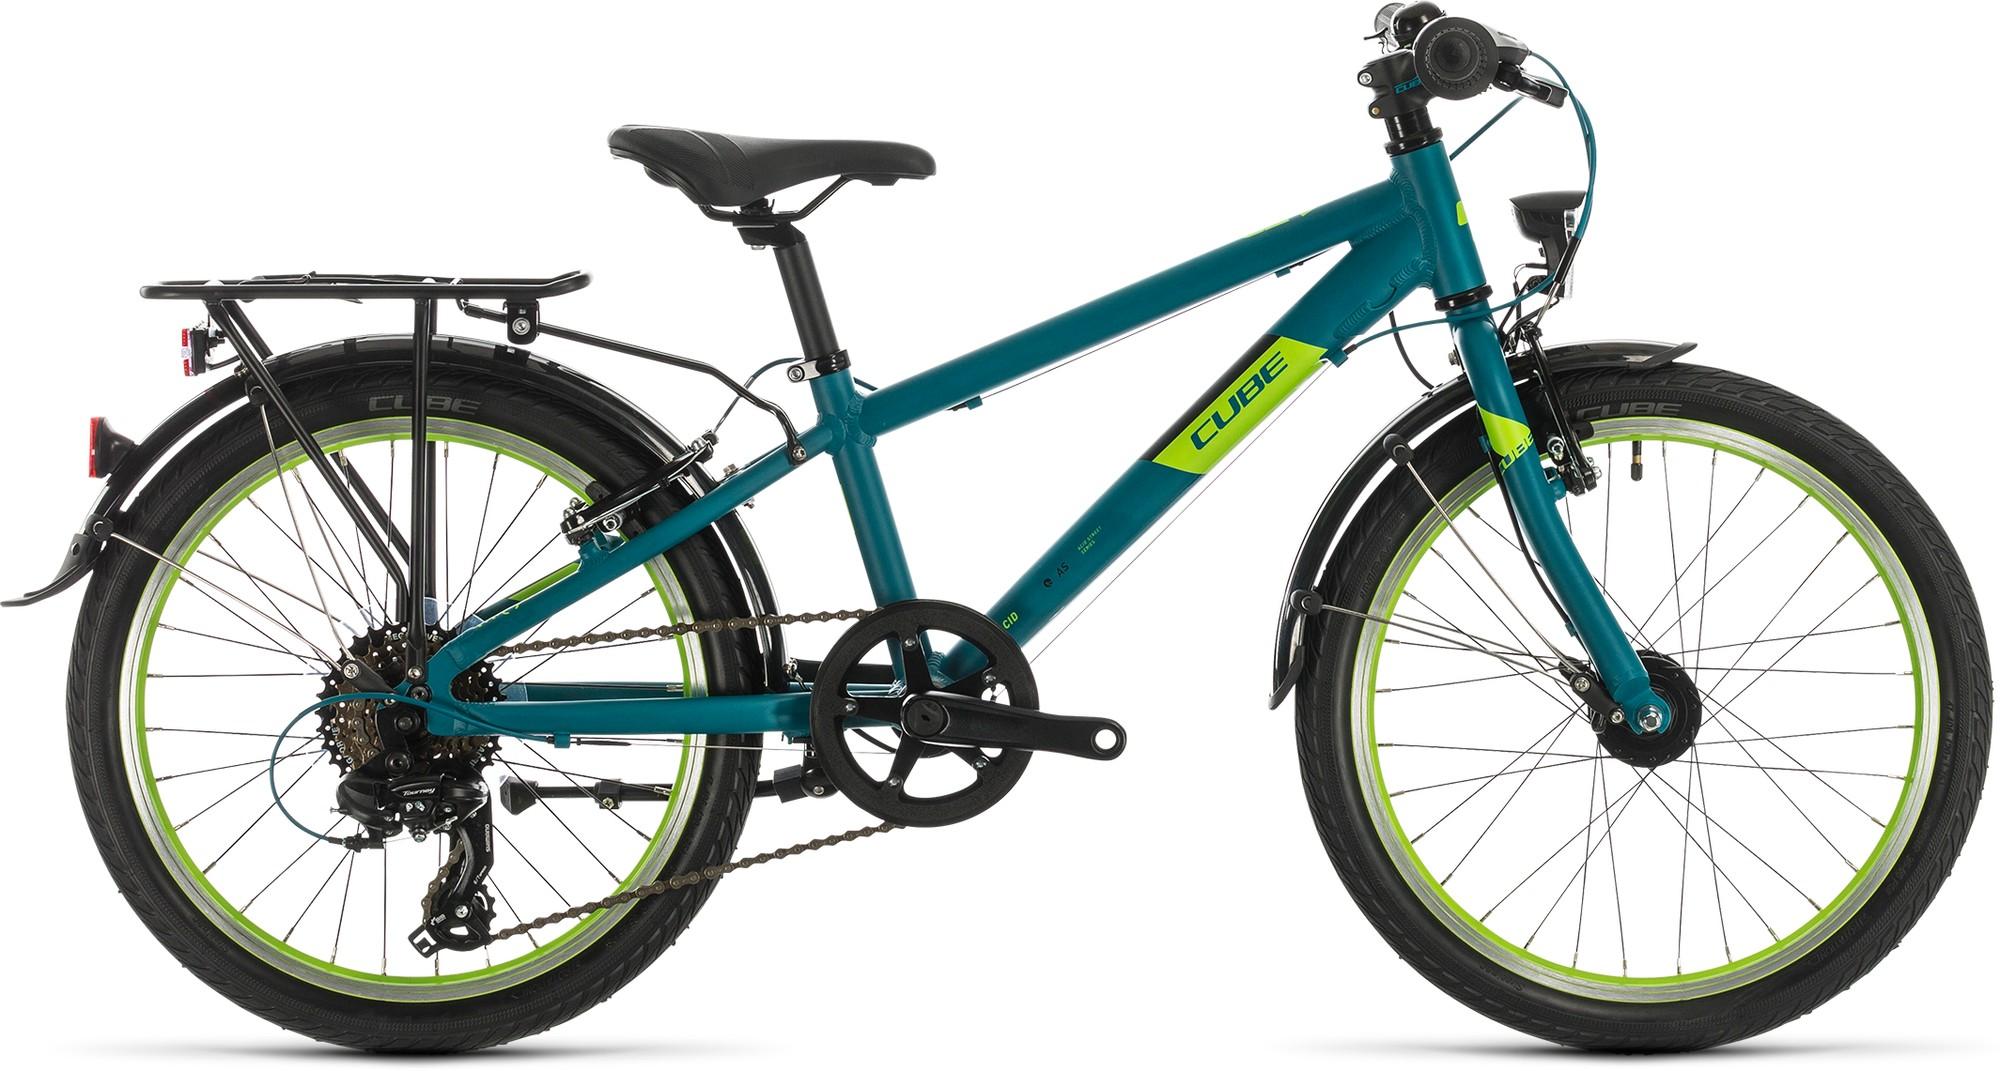 Cube Велосипед детский CUBE Kid 200 Street велосипед cube hyde 2018